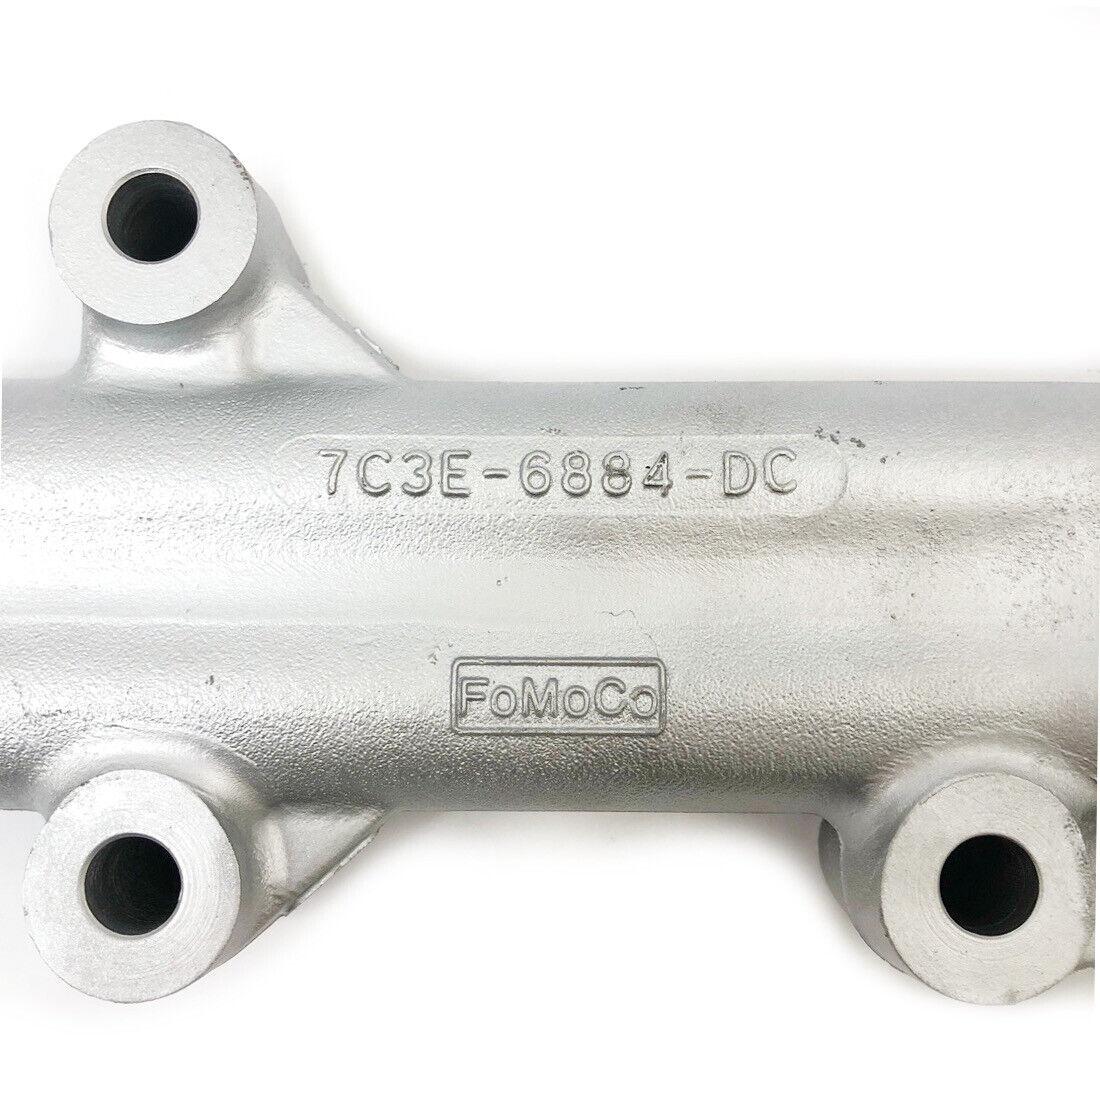 CC5 2012 FORD E350 SUPER DUTY OIL FILTER HOUSING YC2E 6884 A4A